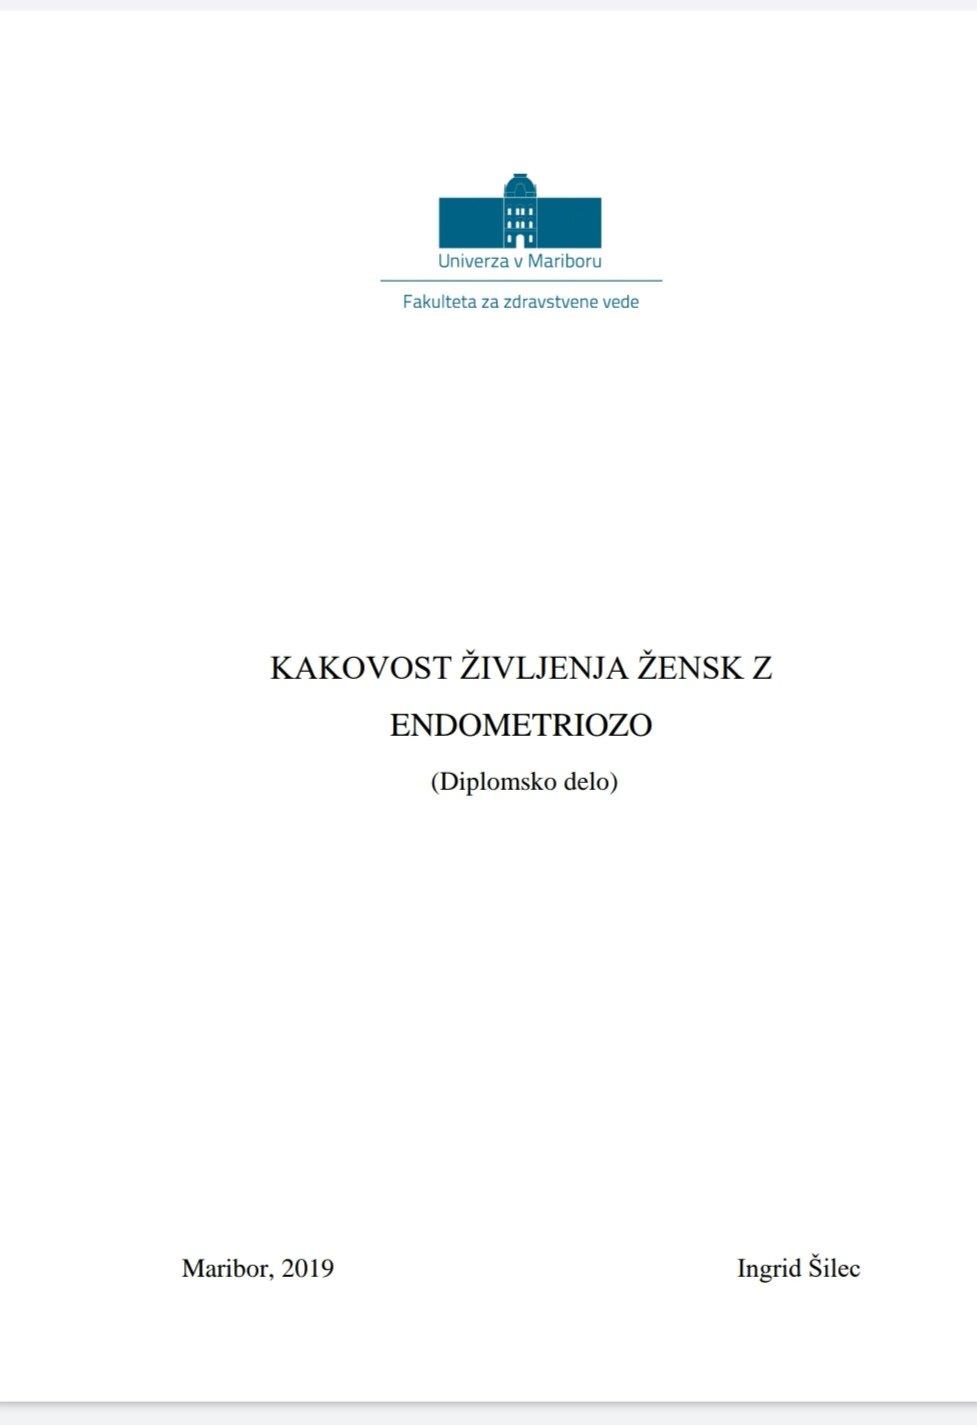 screenshot 20191205 0630128428821397722197 - Izguba ledvice -Dr. Shaheen Khazali, specialist za endometriozo